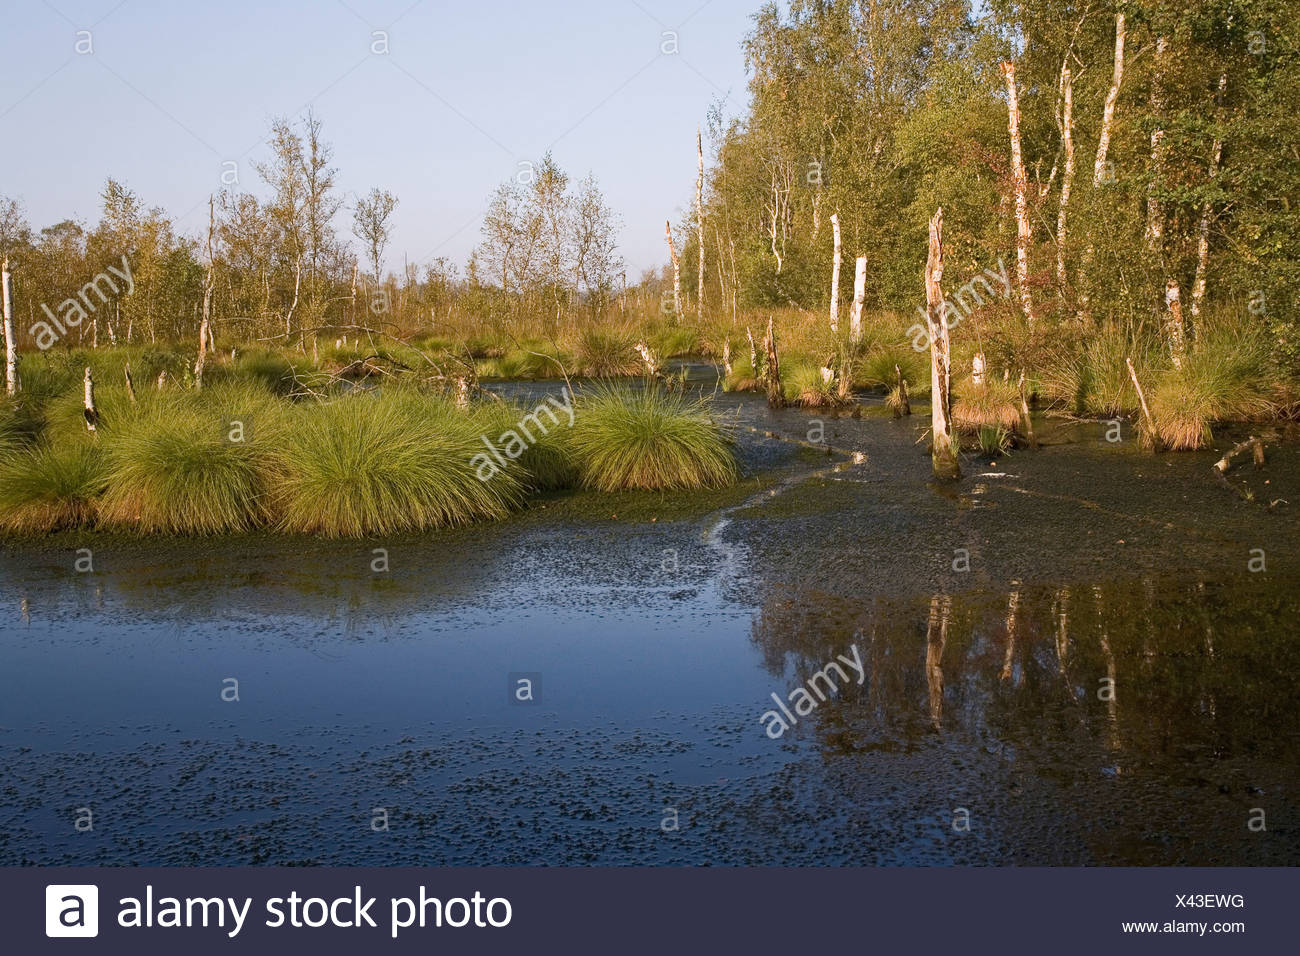 moor landscape, birch trees, Toten Moor, Dead Moor, Lower Saxony, northern Germany - Stock Image